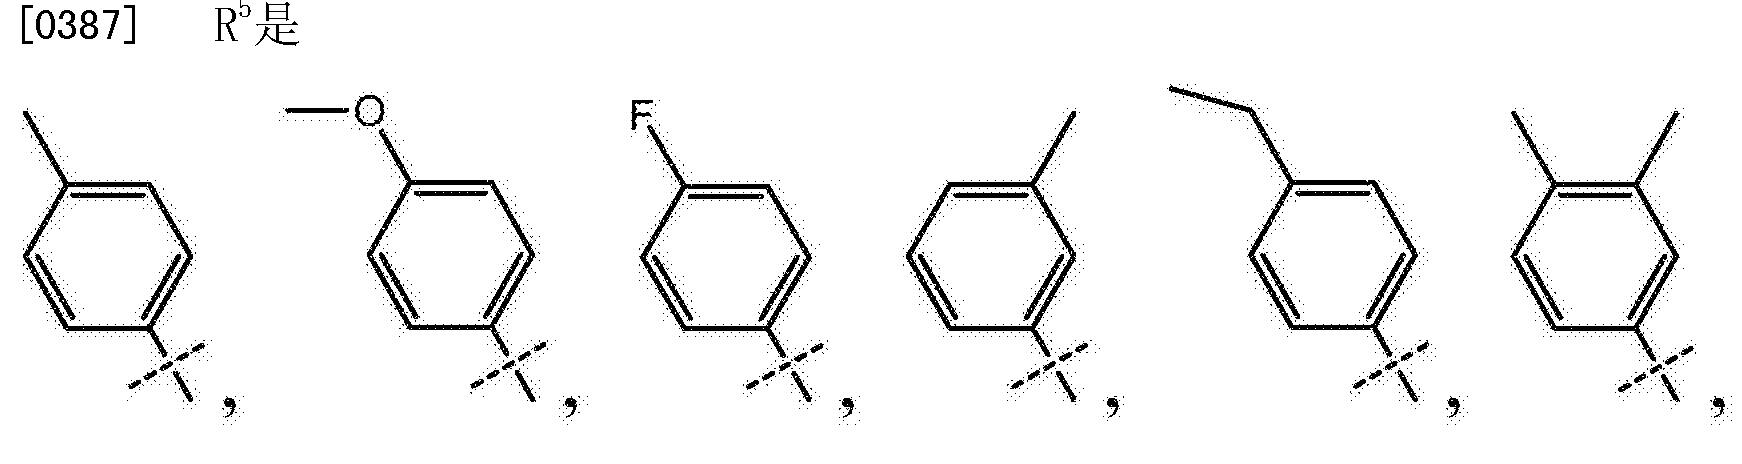 Figure CN105189500AD00311